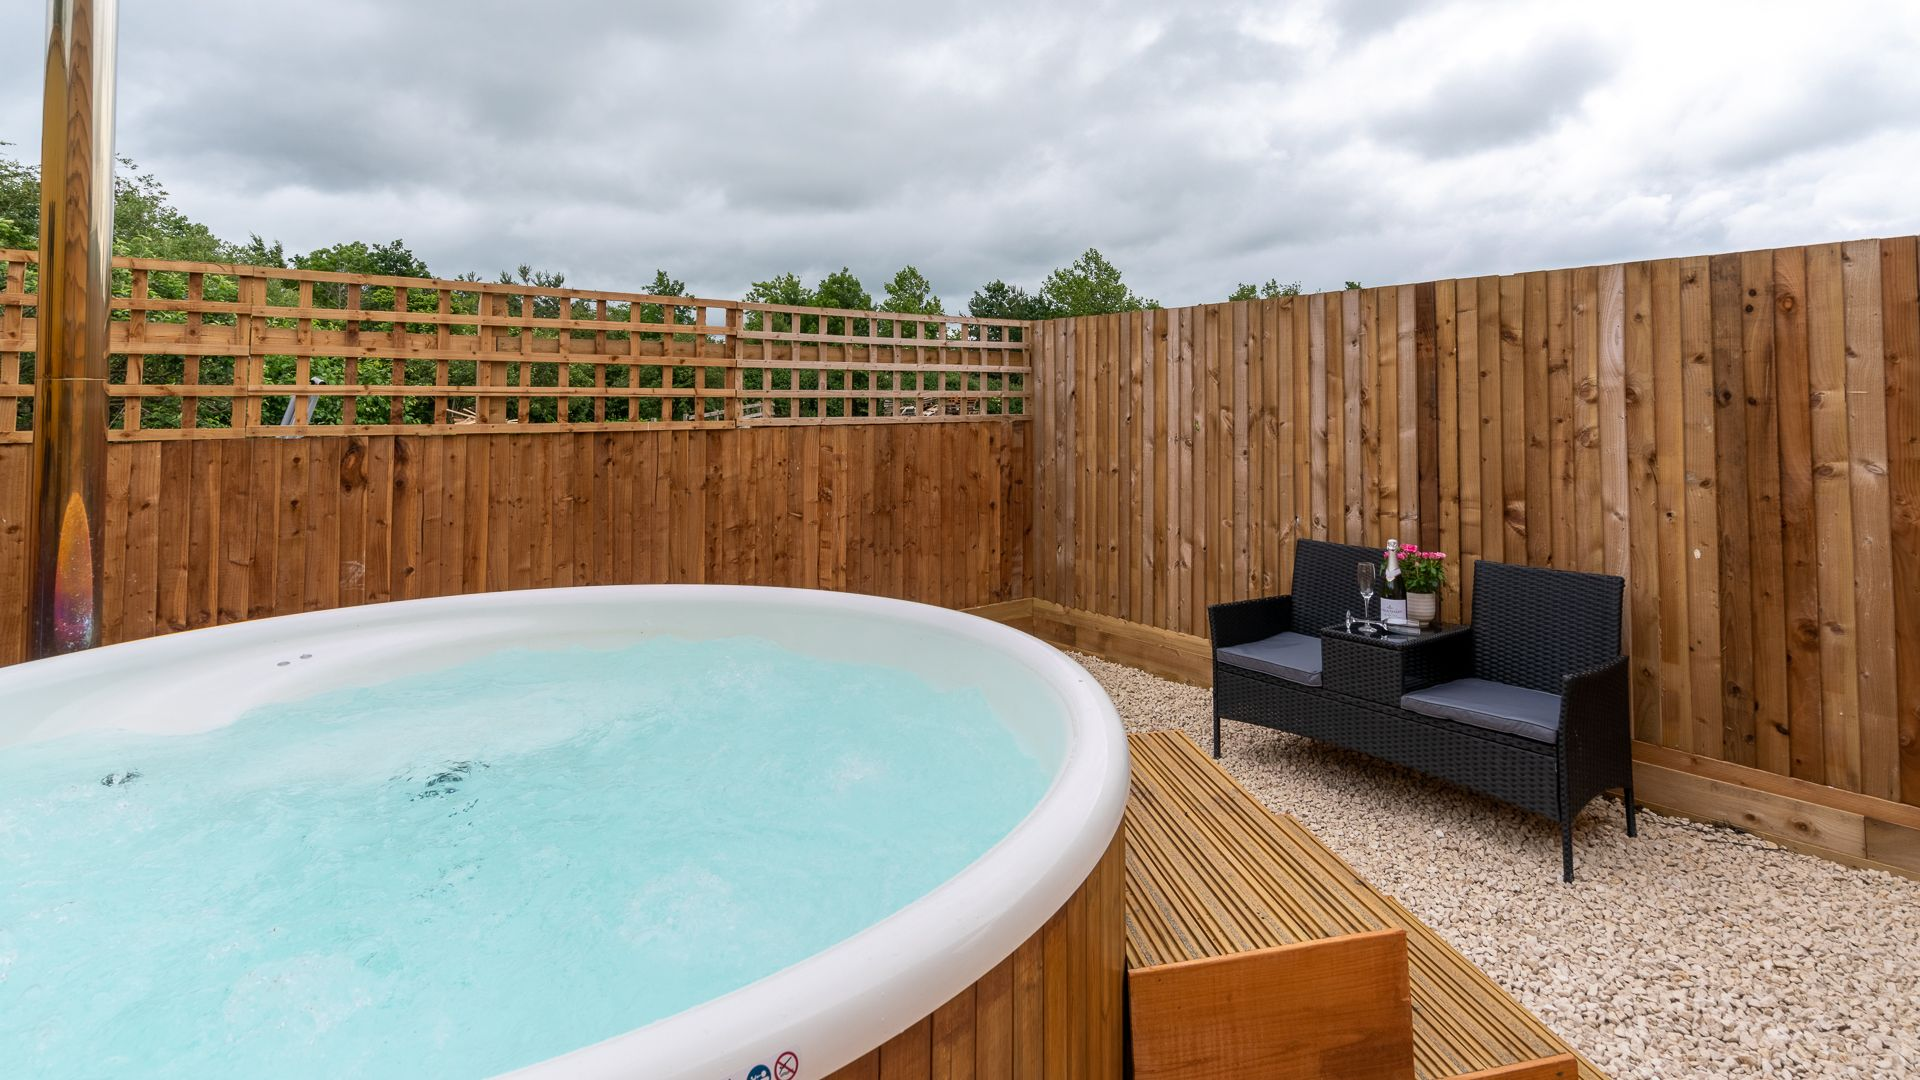 Wood-fired Hot Tub, Lily Barn at Laburnum Farm Estate, Bolthole Retreats